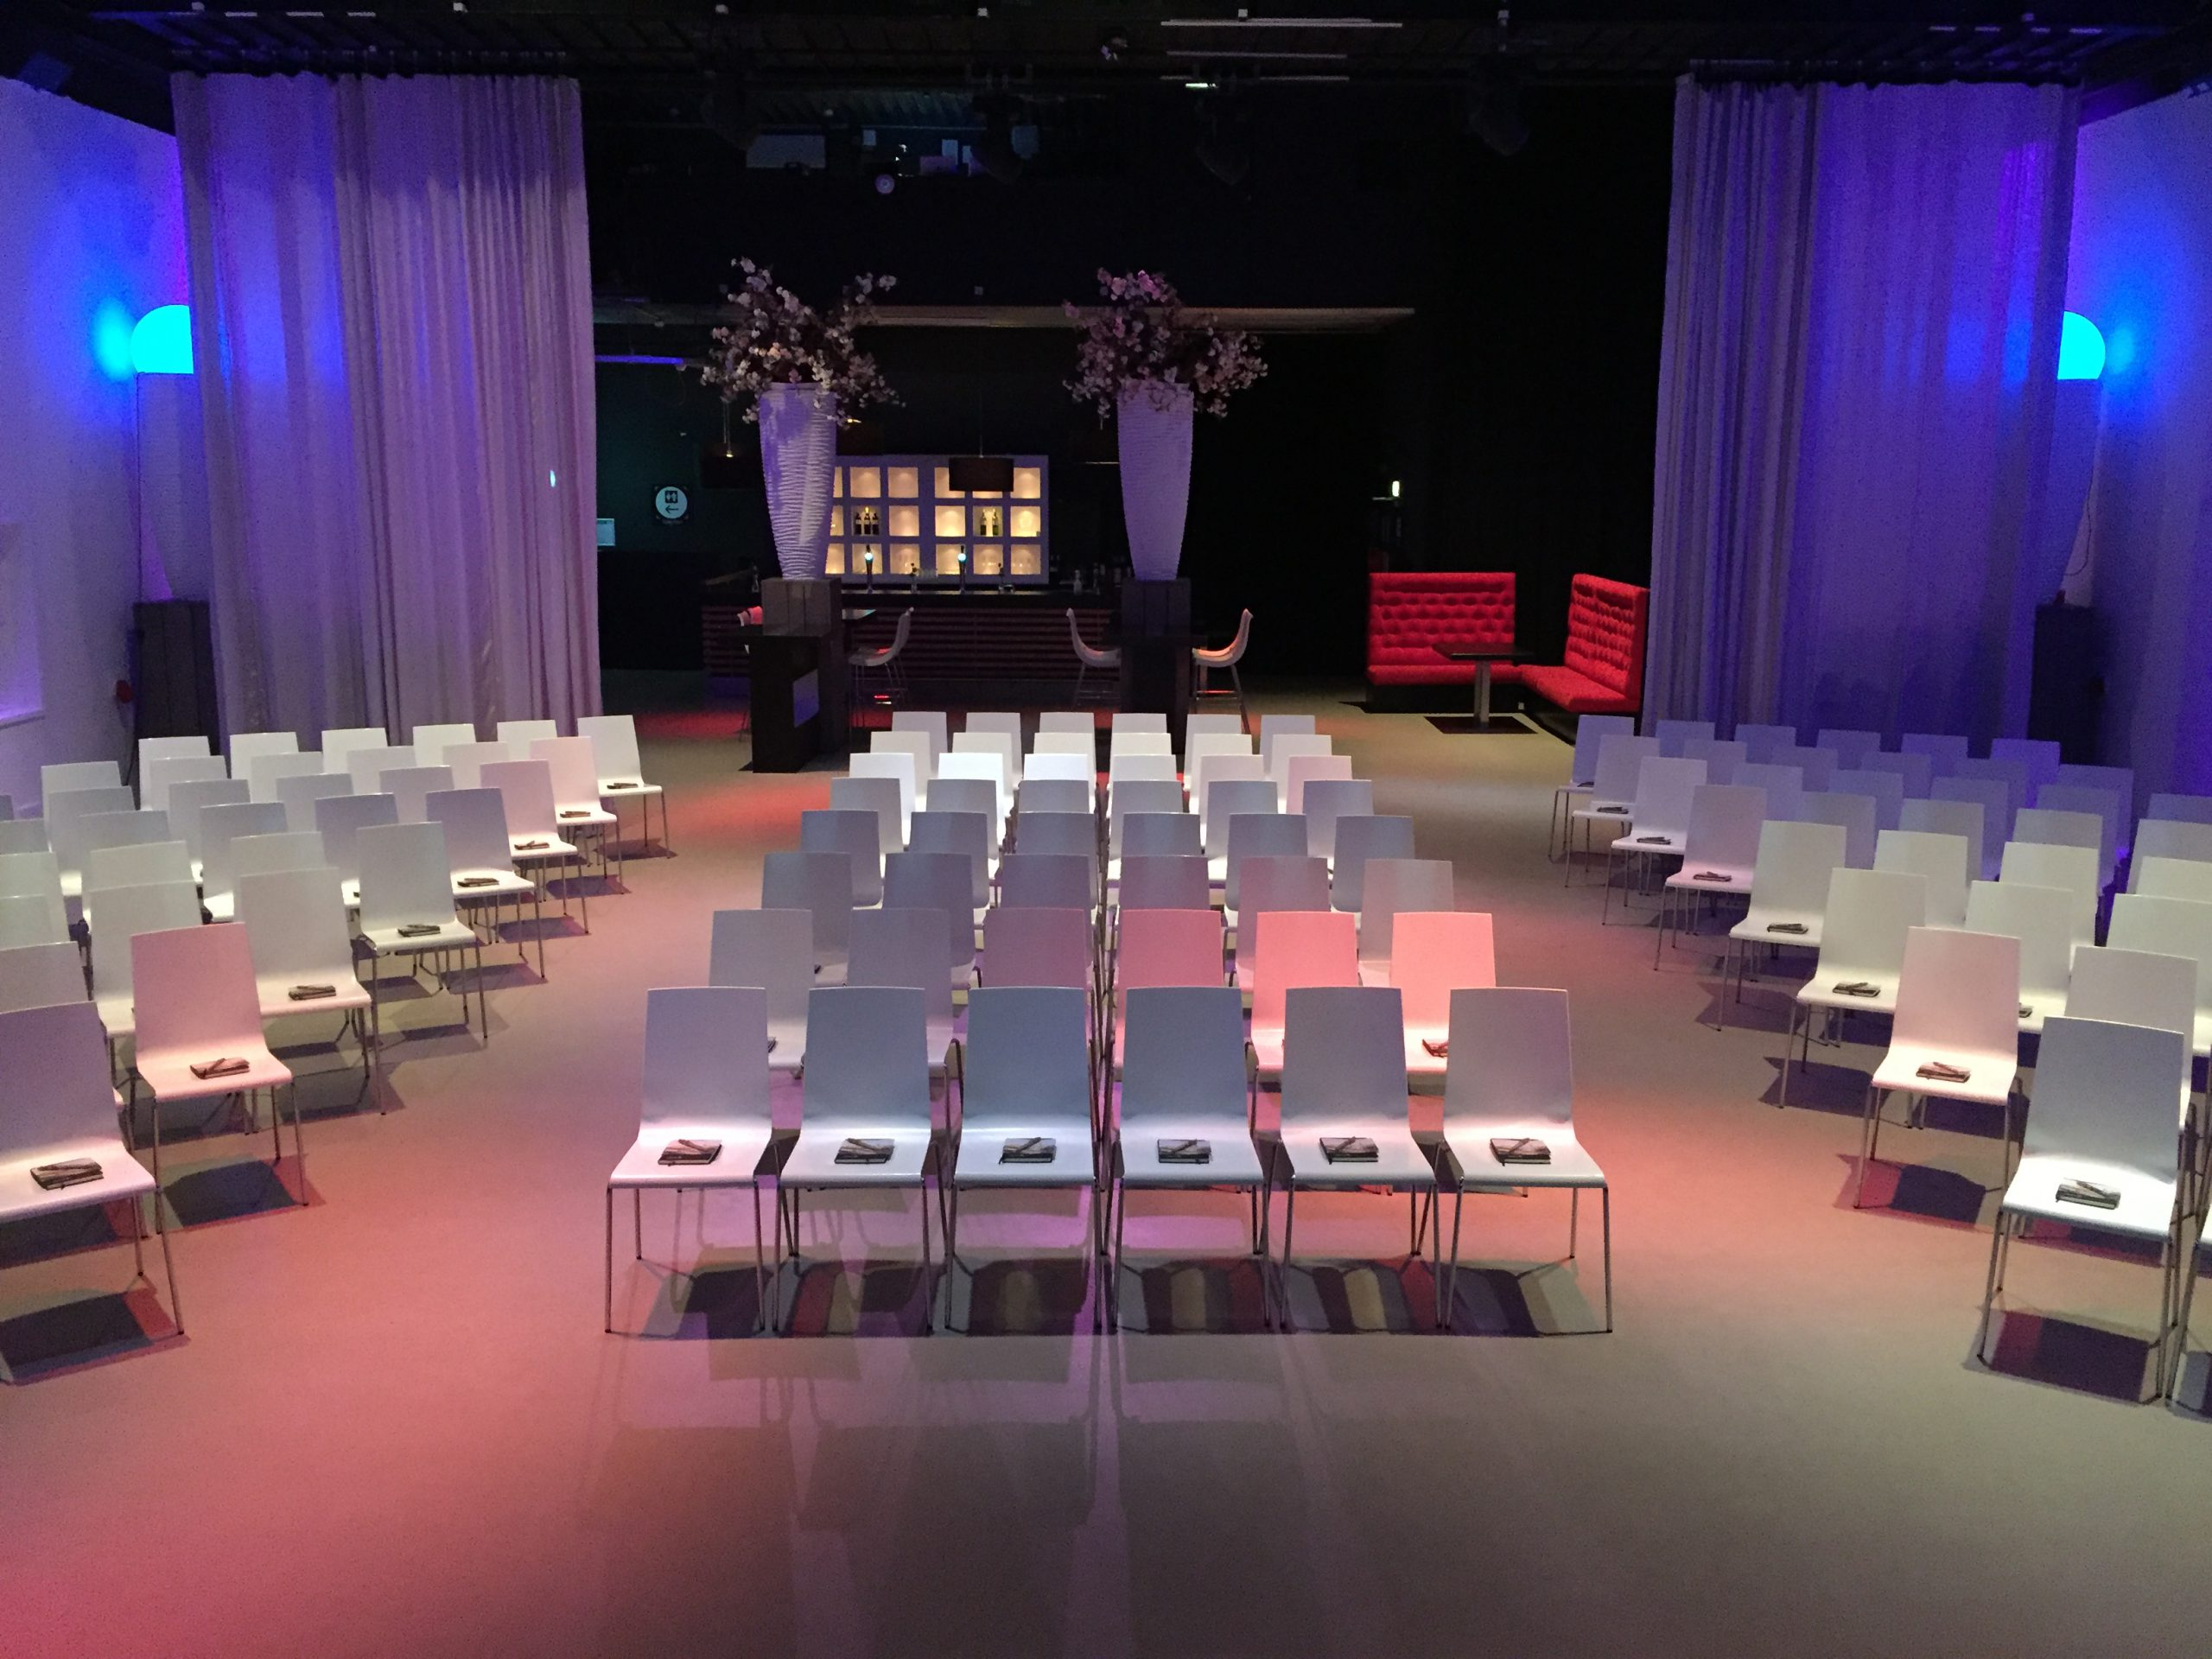 Hal4 aan de Maas theateropstelling